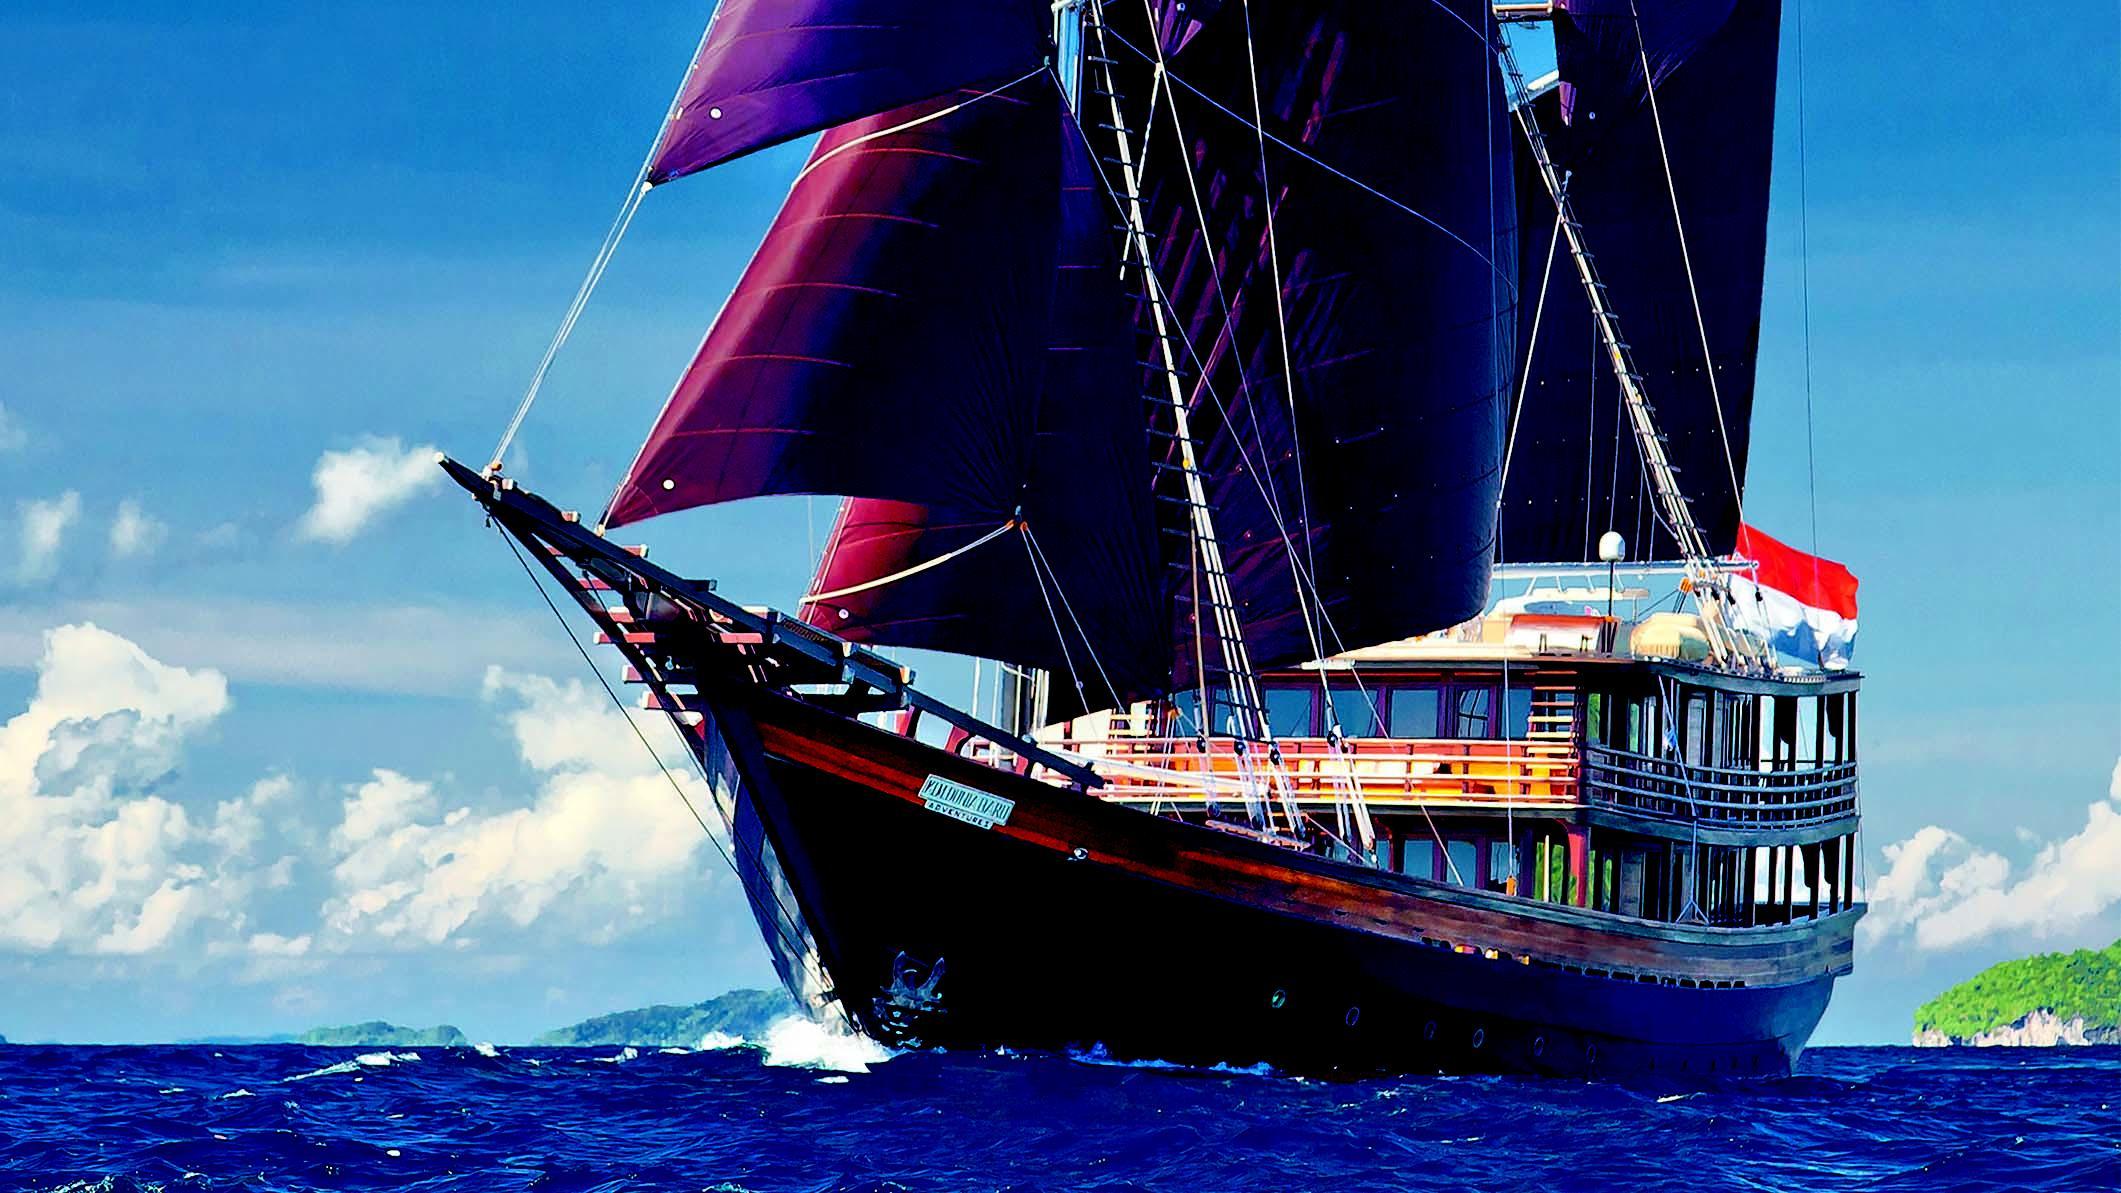 dunia-baru-sailing-yacht-konjo-2014-51m-sailing